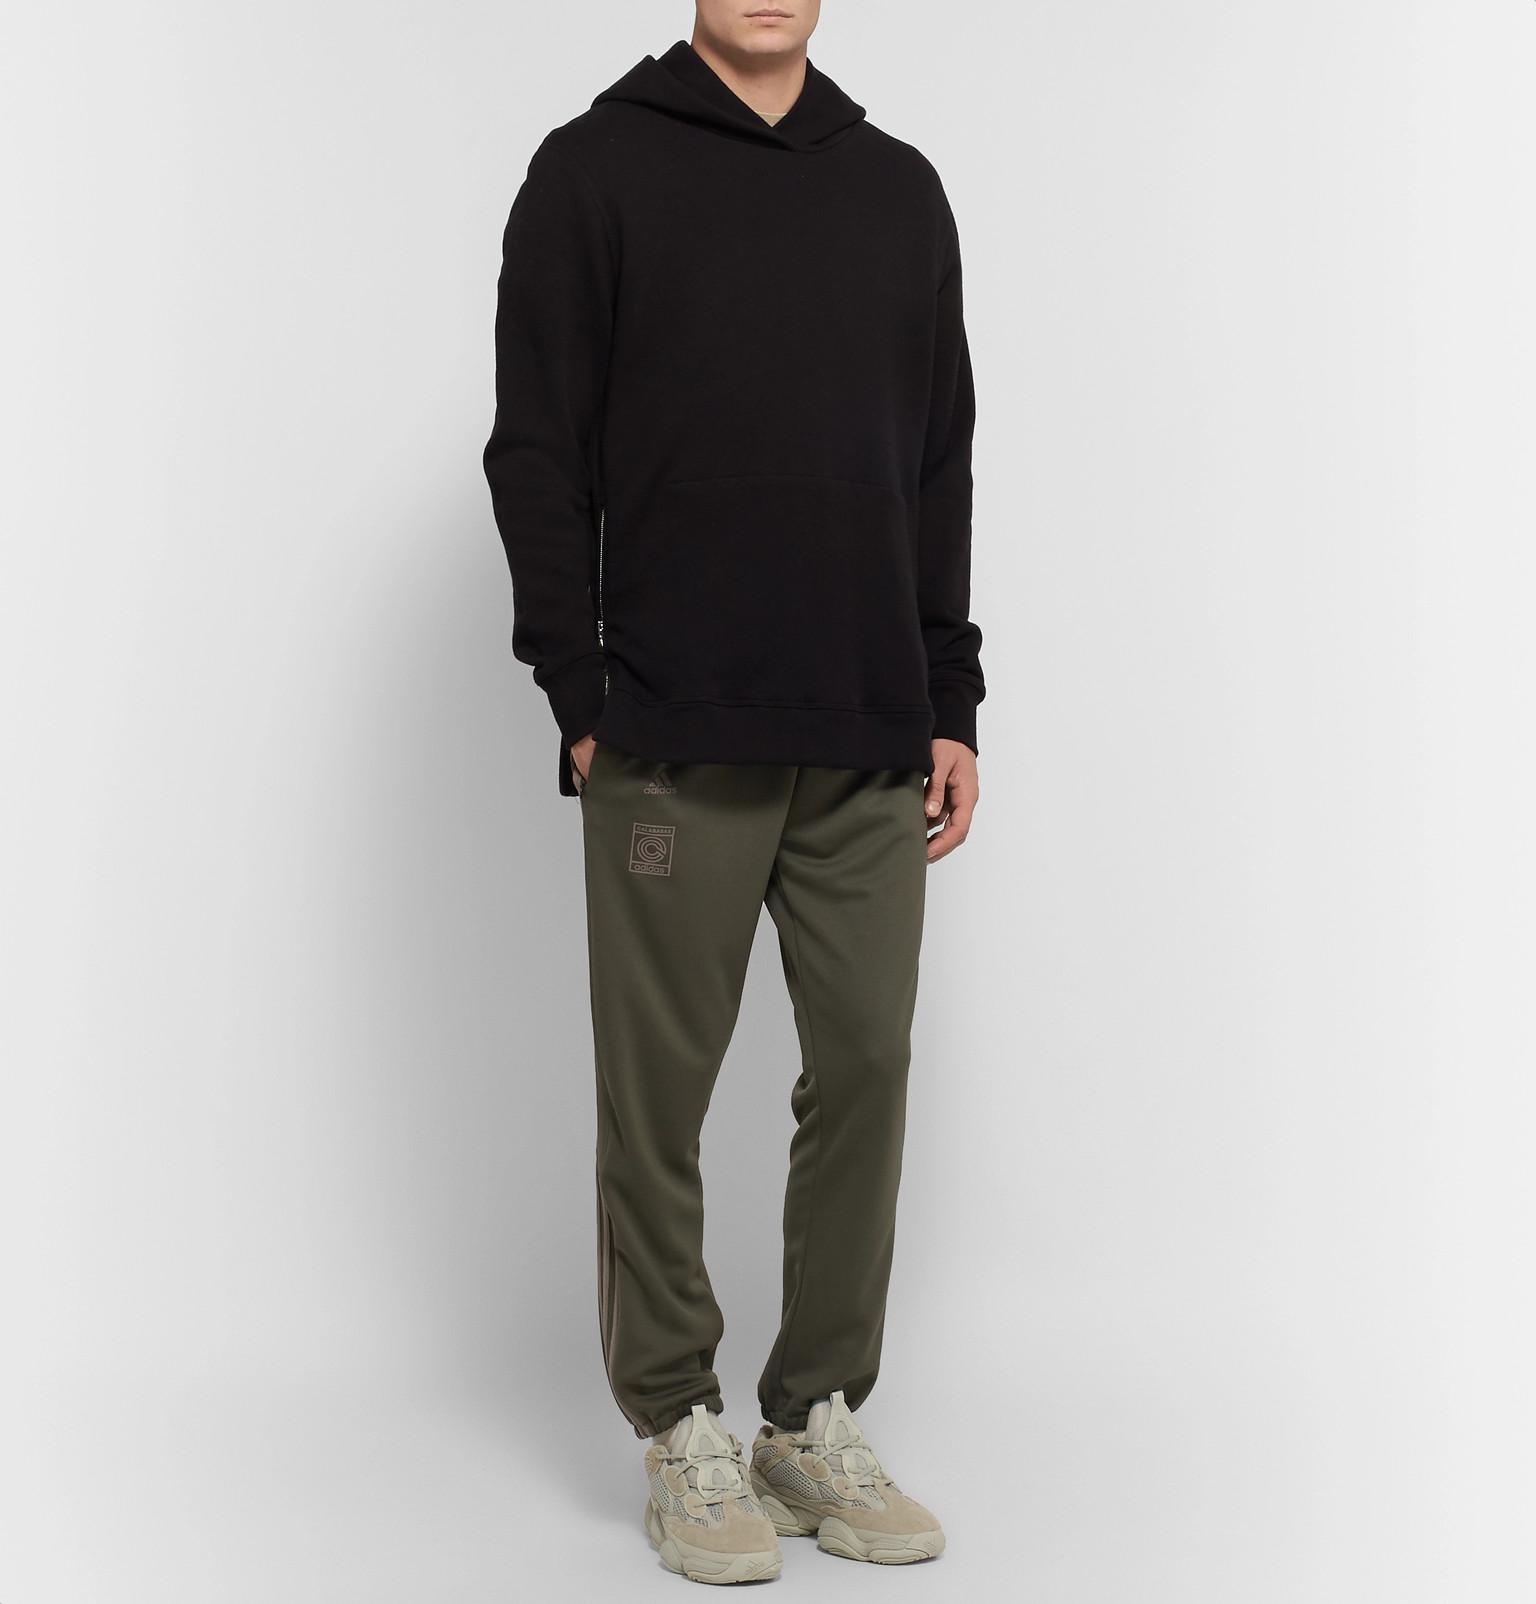 1845ab590ea88 adidas Originals + Yeezy Calabasas Slim-fit Tapered Striped Jersey ...